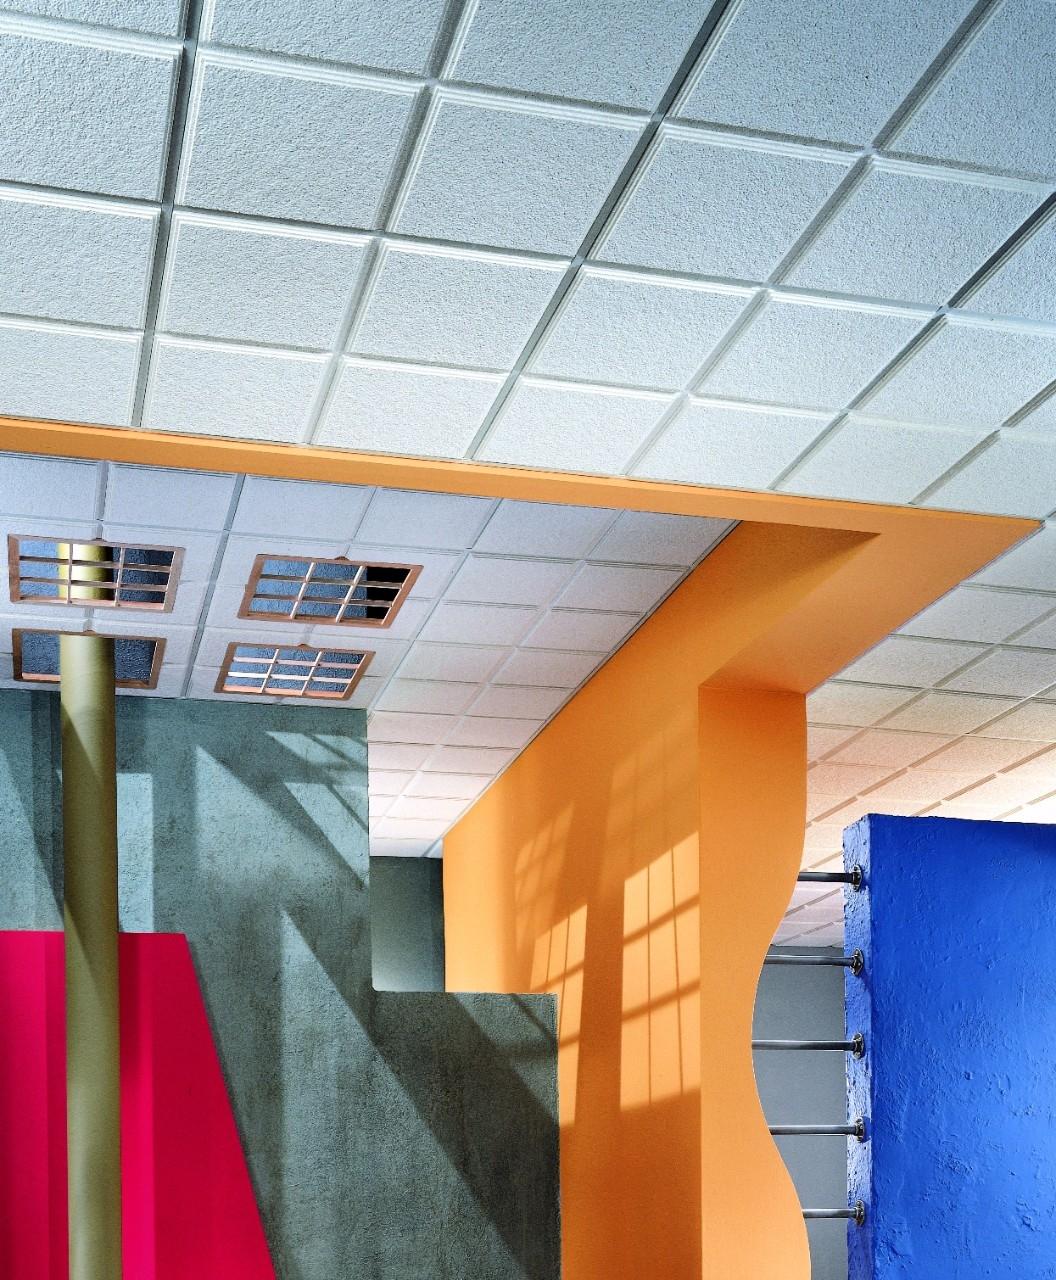 Noise Reducing Acoustical Ceiling Tiles